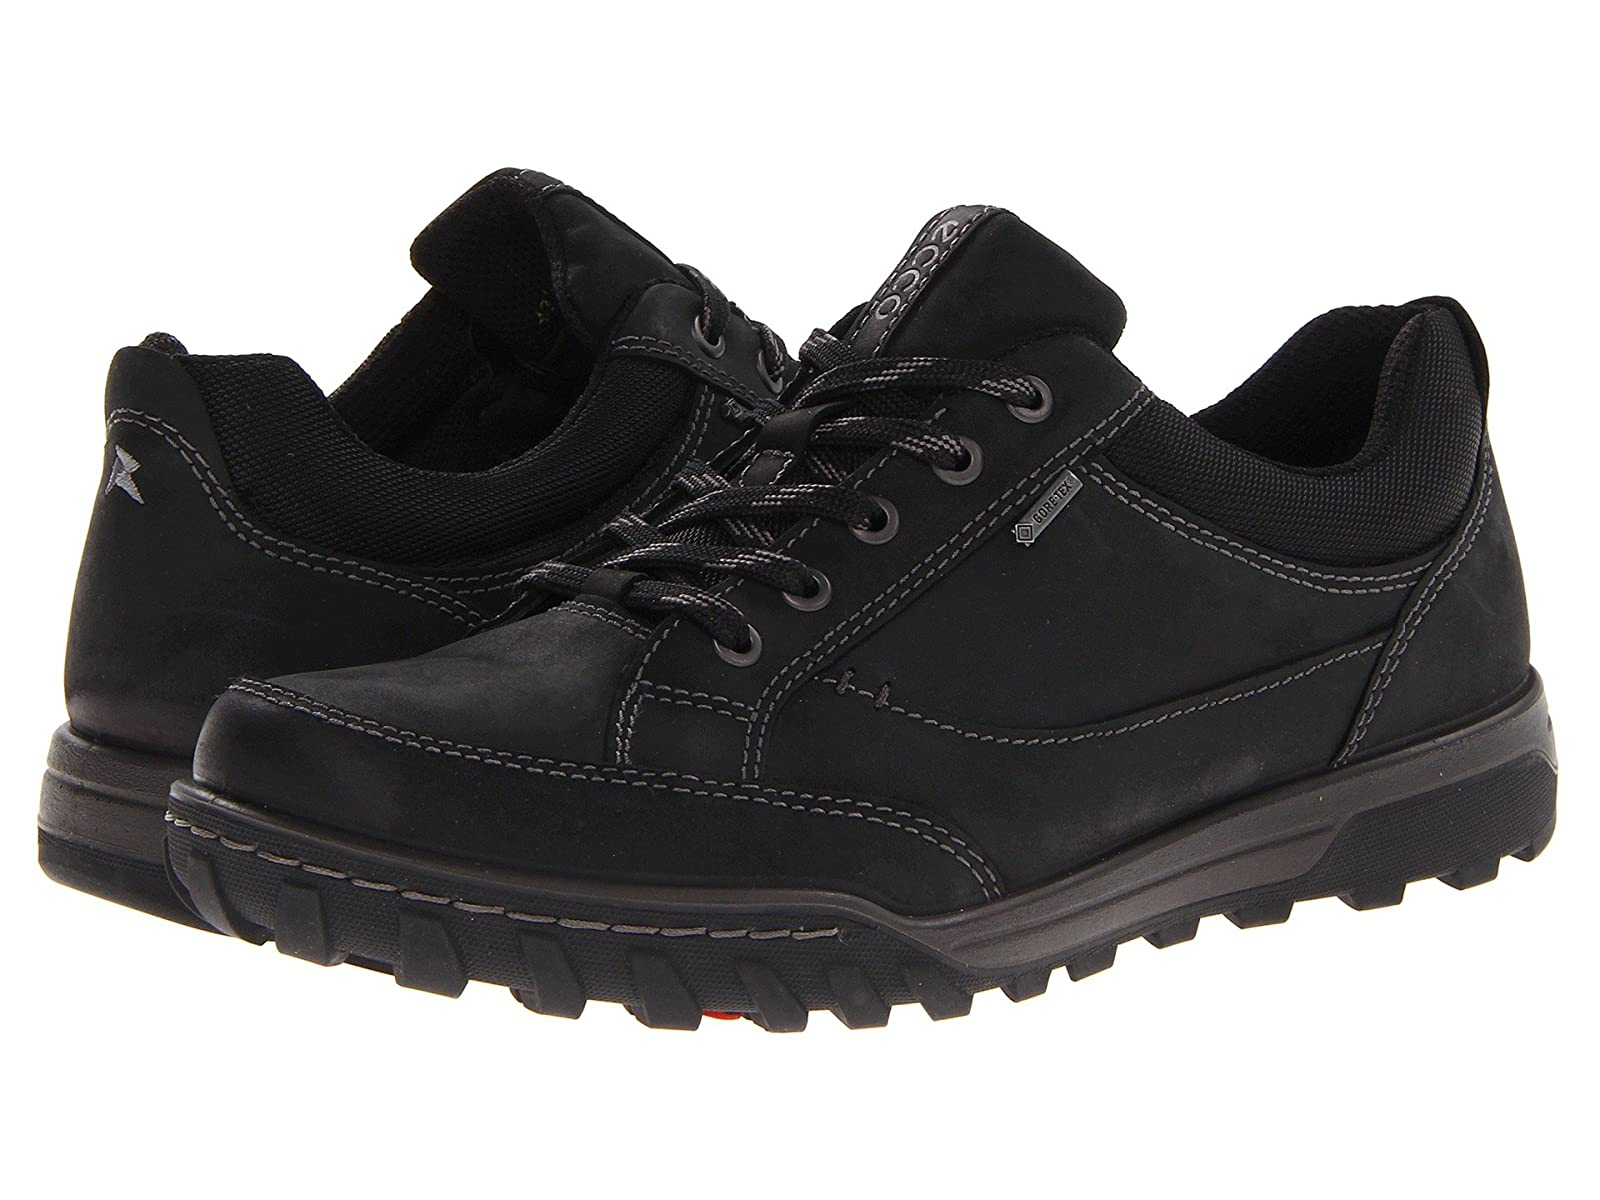 ECCO Sport Goran GTX®Cheap and distinctive eye-catching shoes